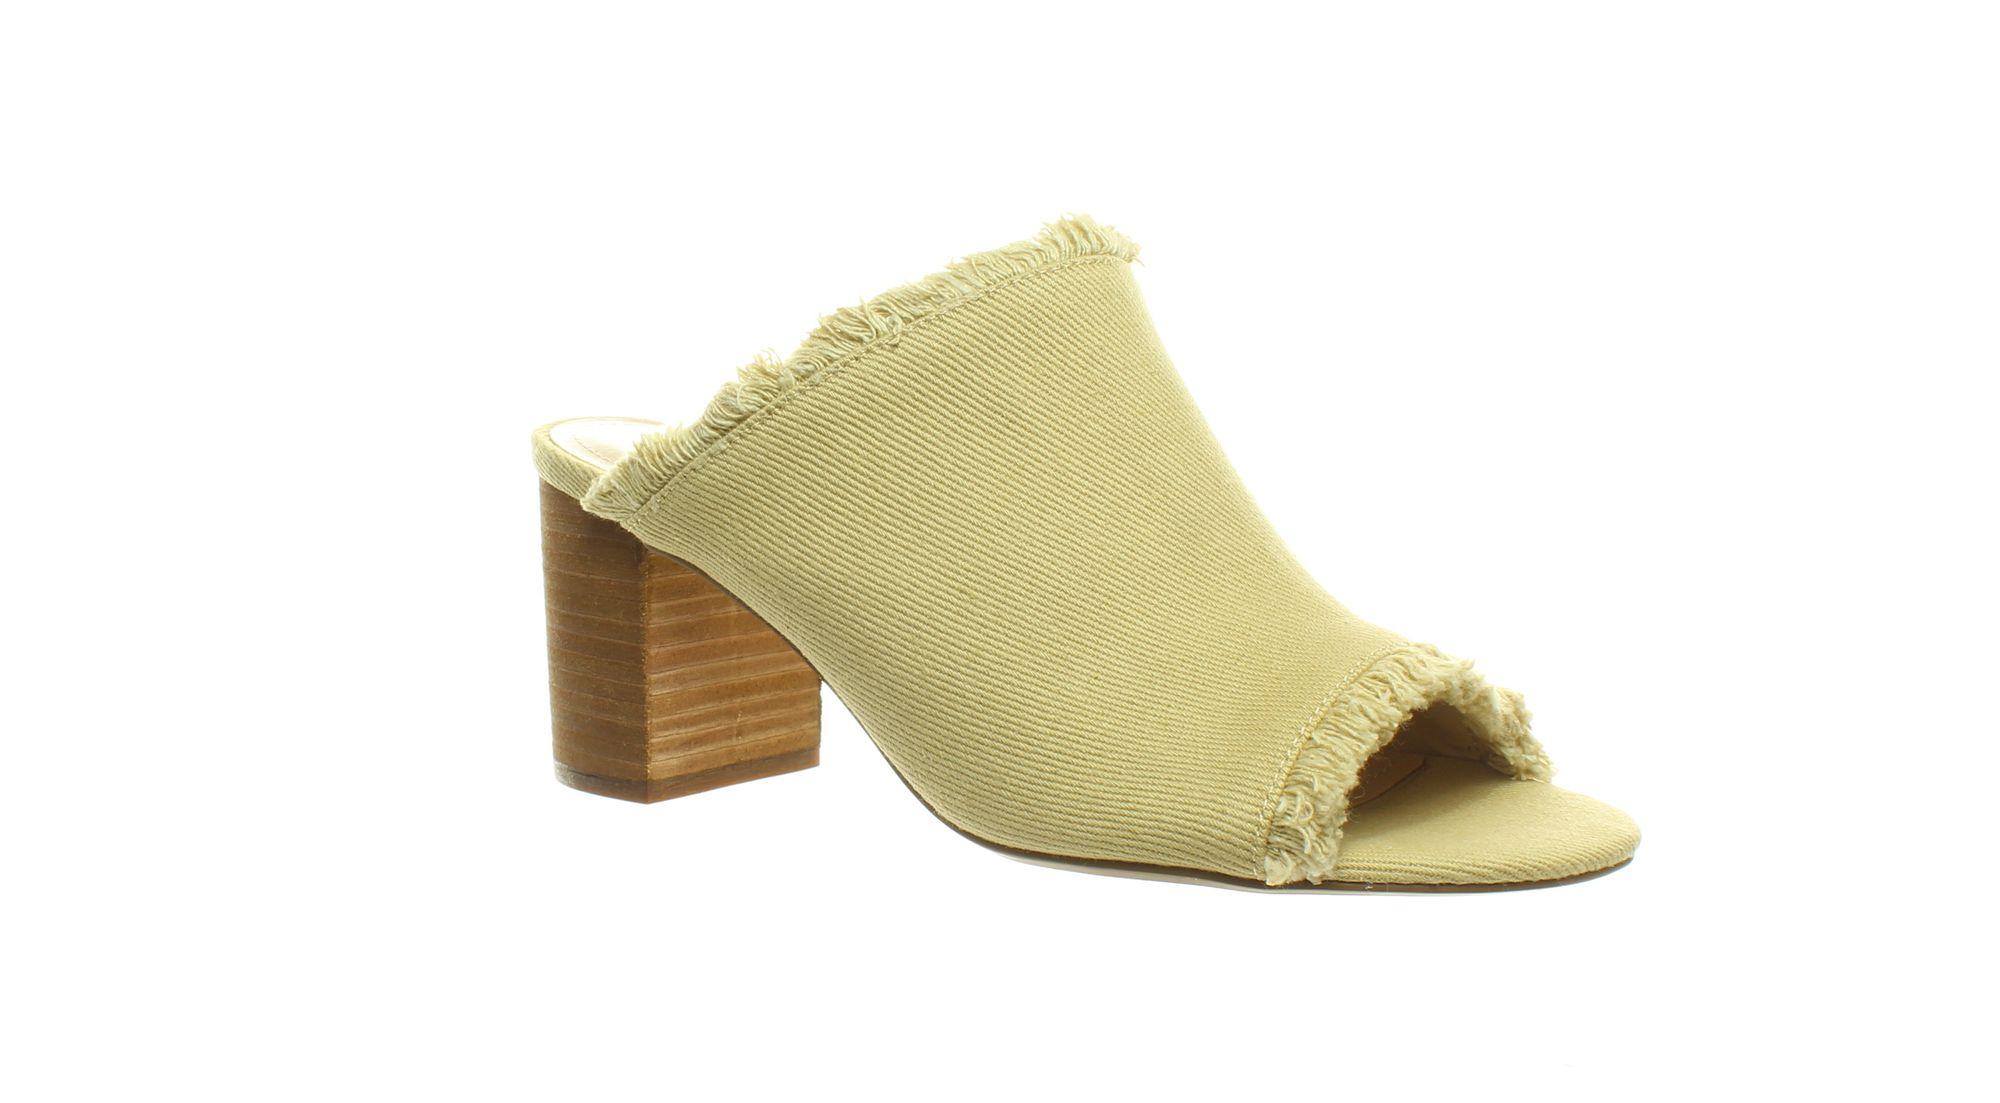 Charles David Womens Kadia Desert Sand Sandals Size 8